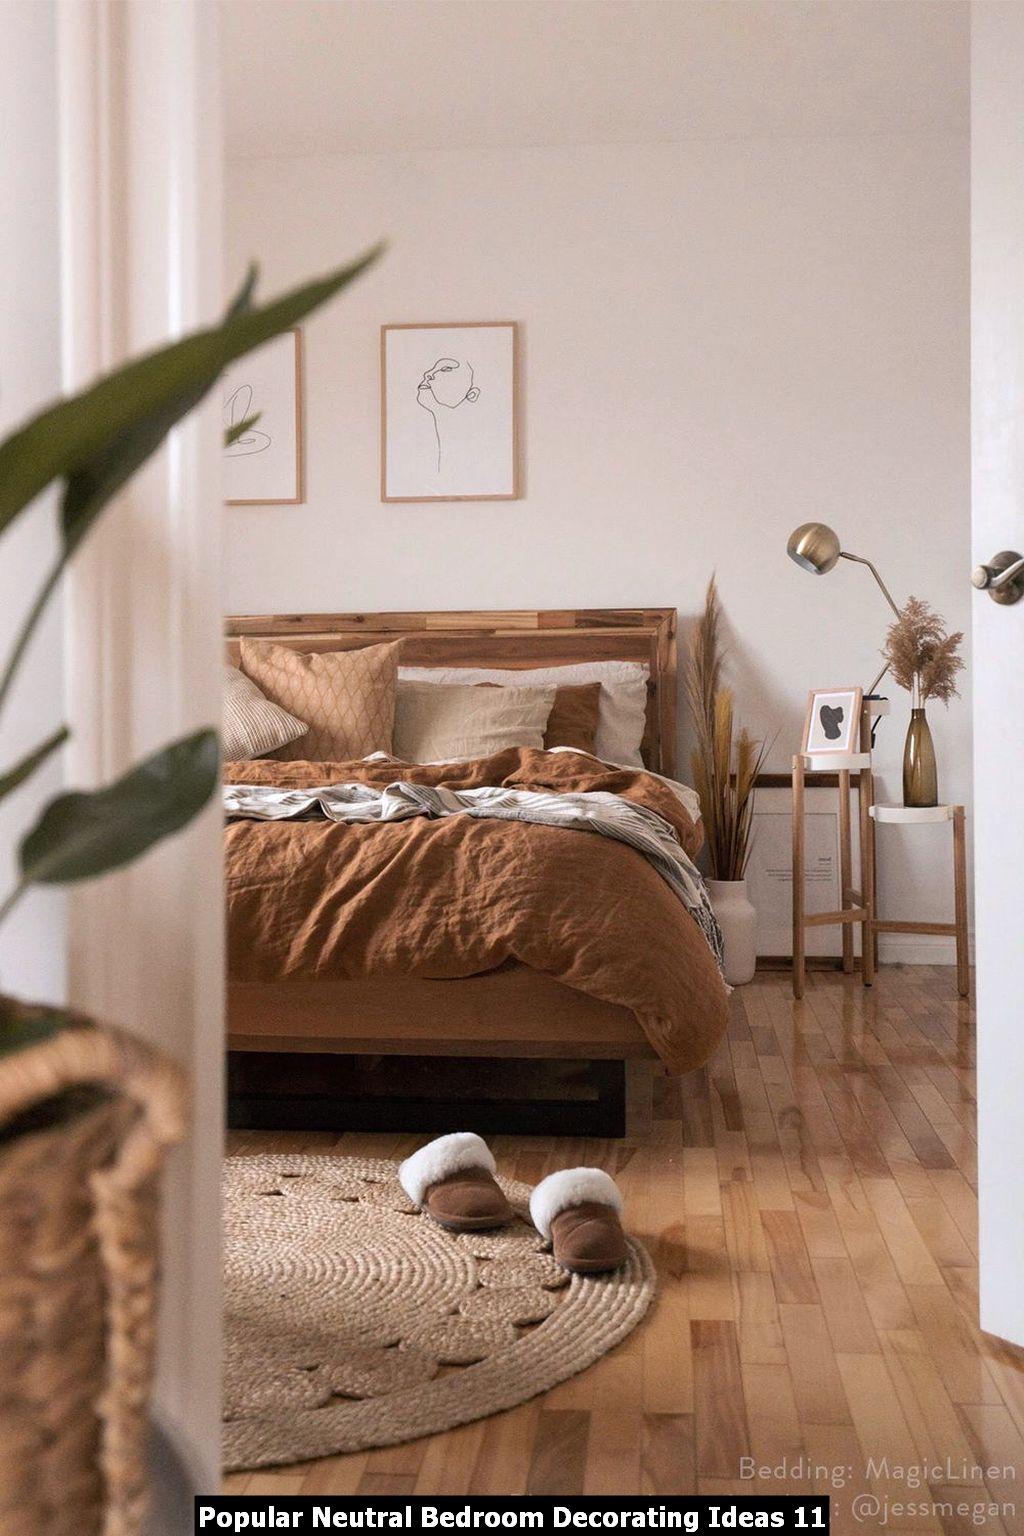 Popular Neutral Bedroom Decorating Ideas 11